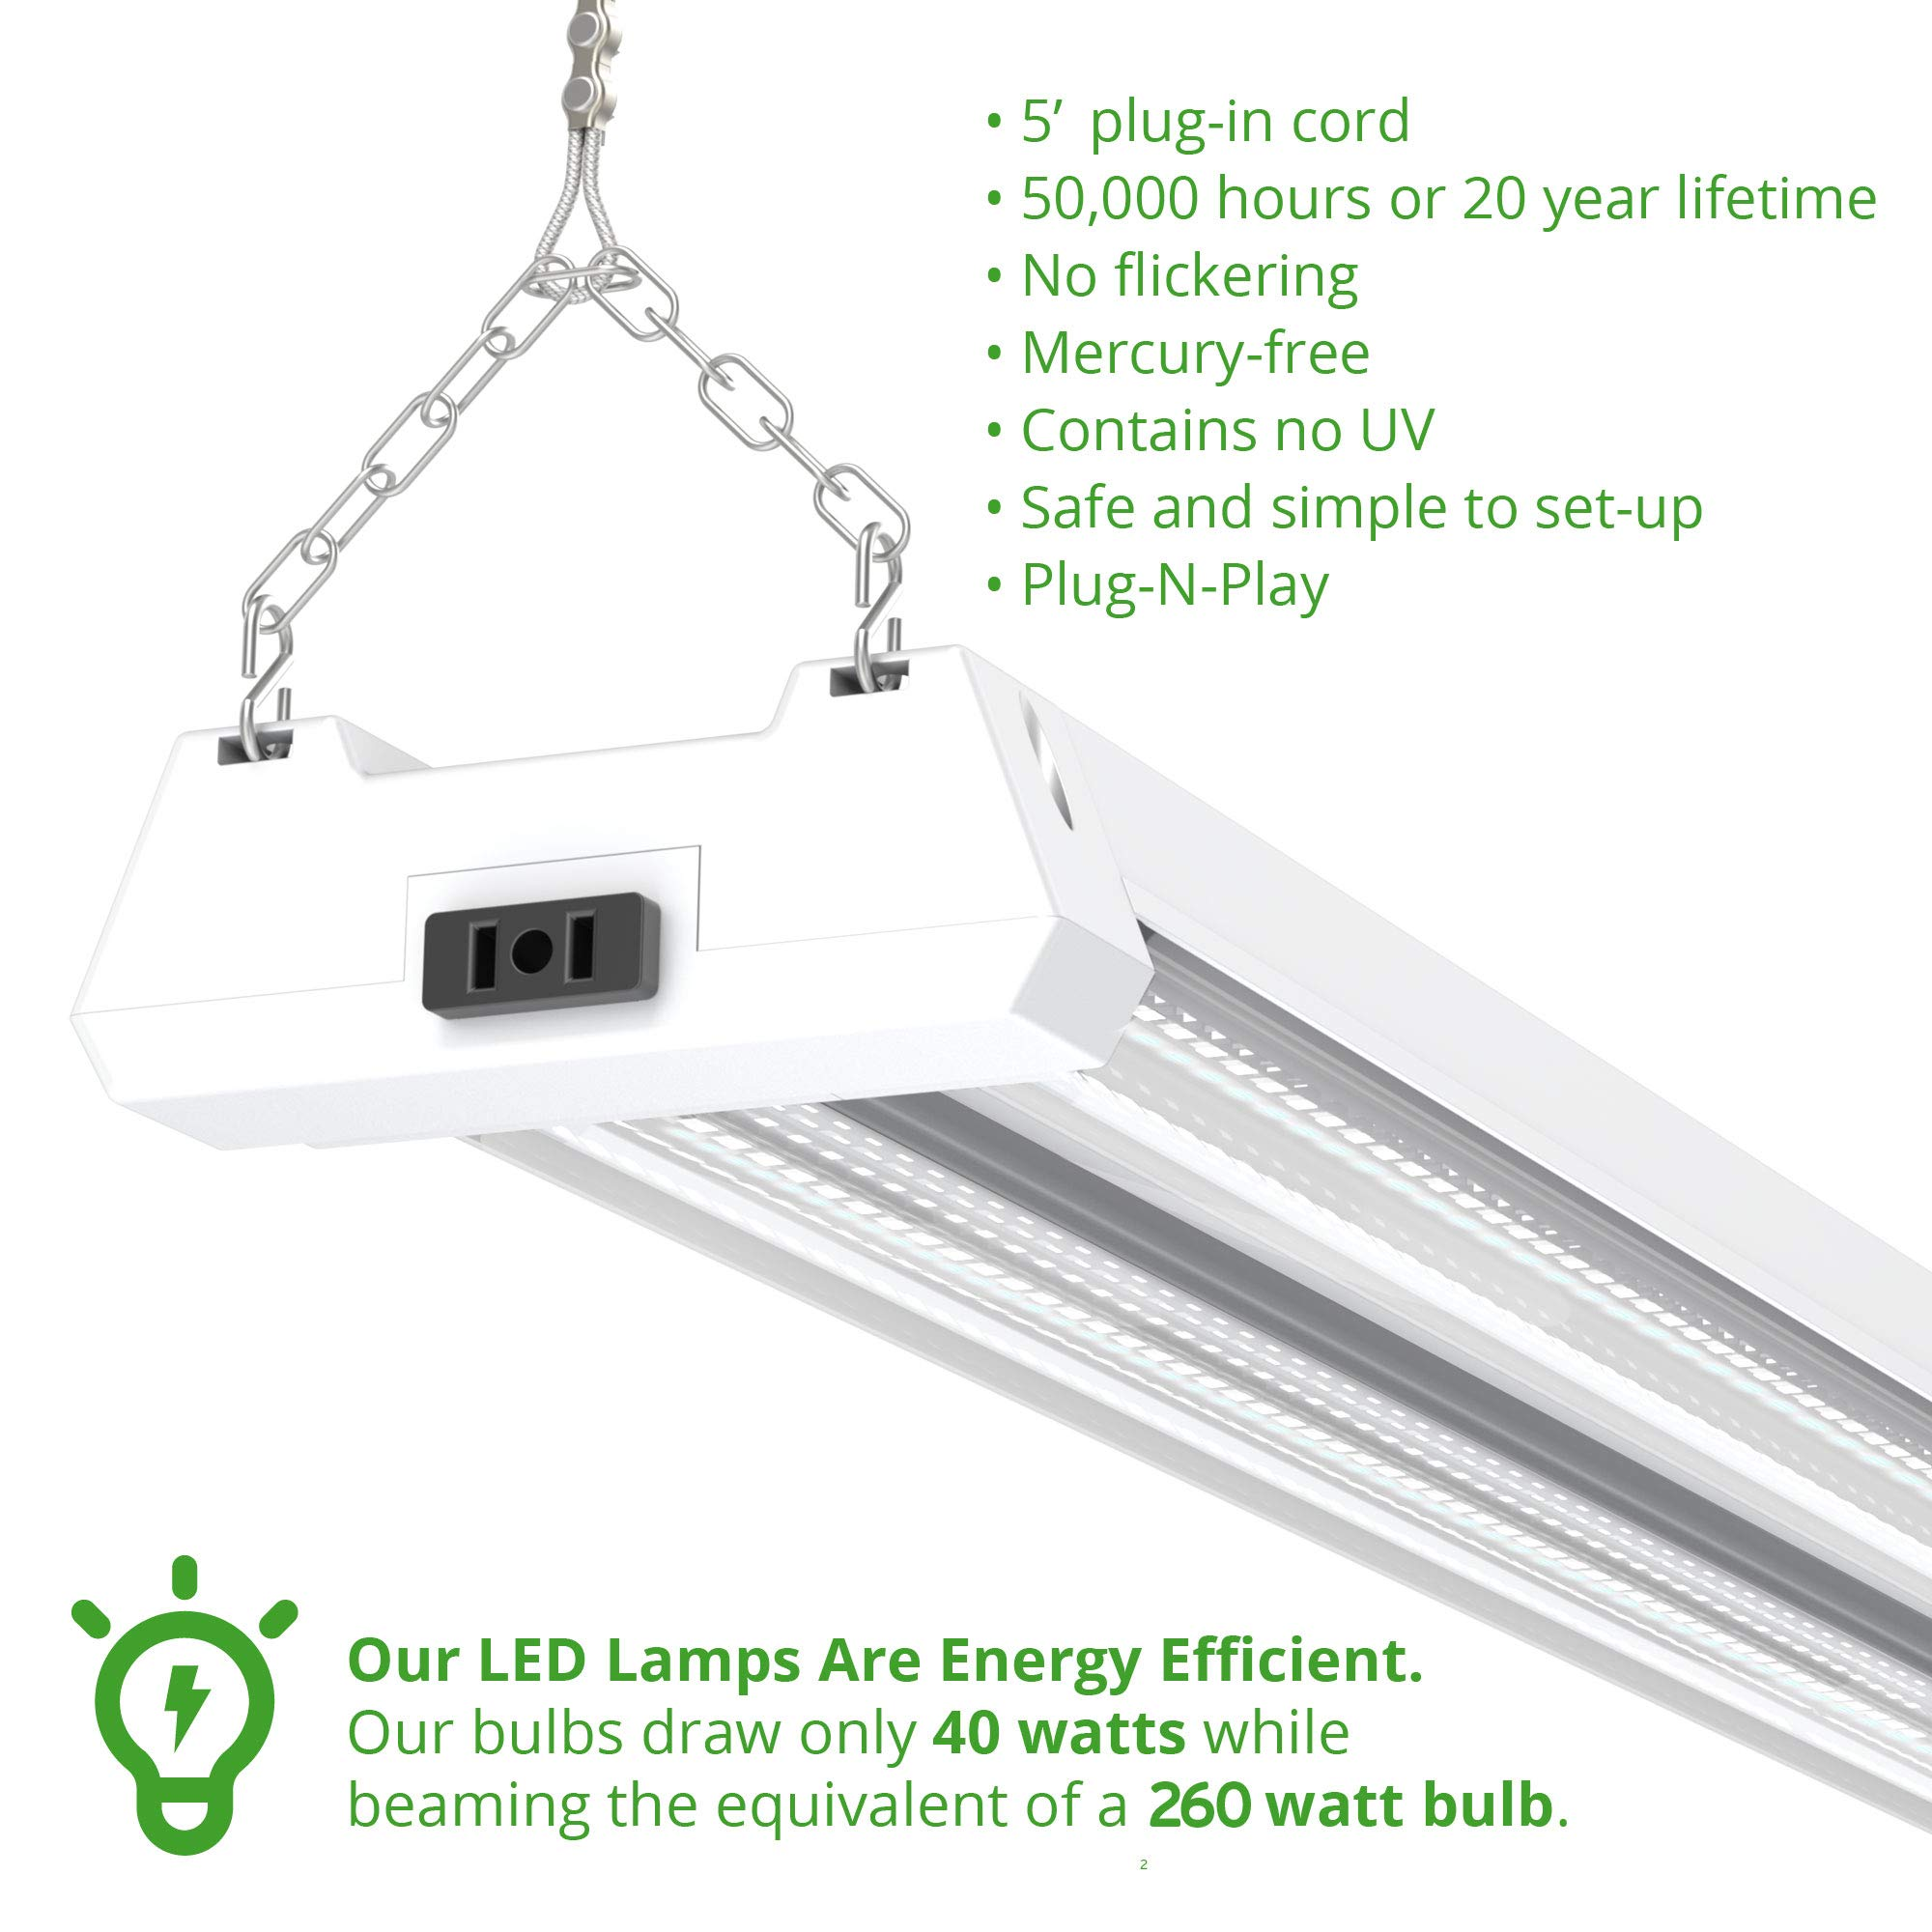 Sunco Lighting 4 Pack 4ft 48 Inch LED Utility Shop Light 40W (260W Equivalent) 5000K Kelvin Daylight, 4500 Lumens, Double Integrated Linkable Garage Ceiling Fixture, Clear Lens - Energy Star/ETL by Sunco Lighting (Image #2)